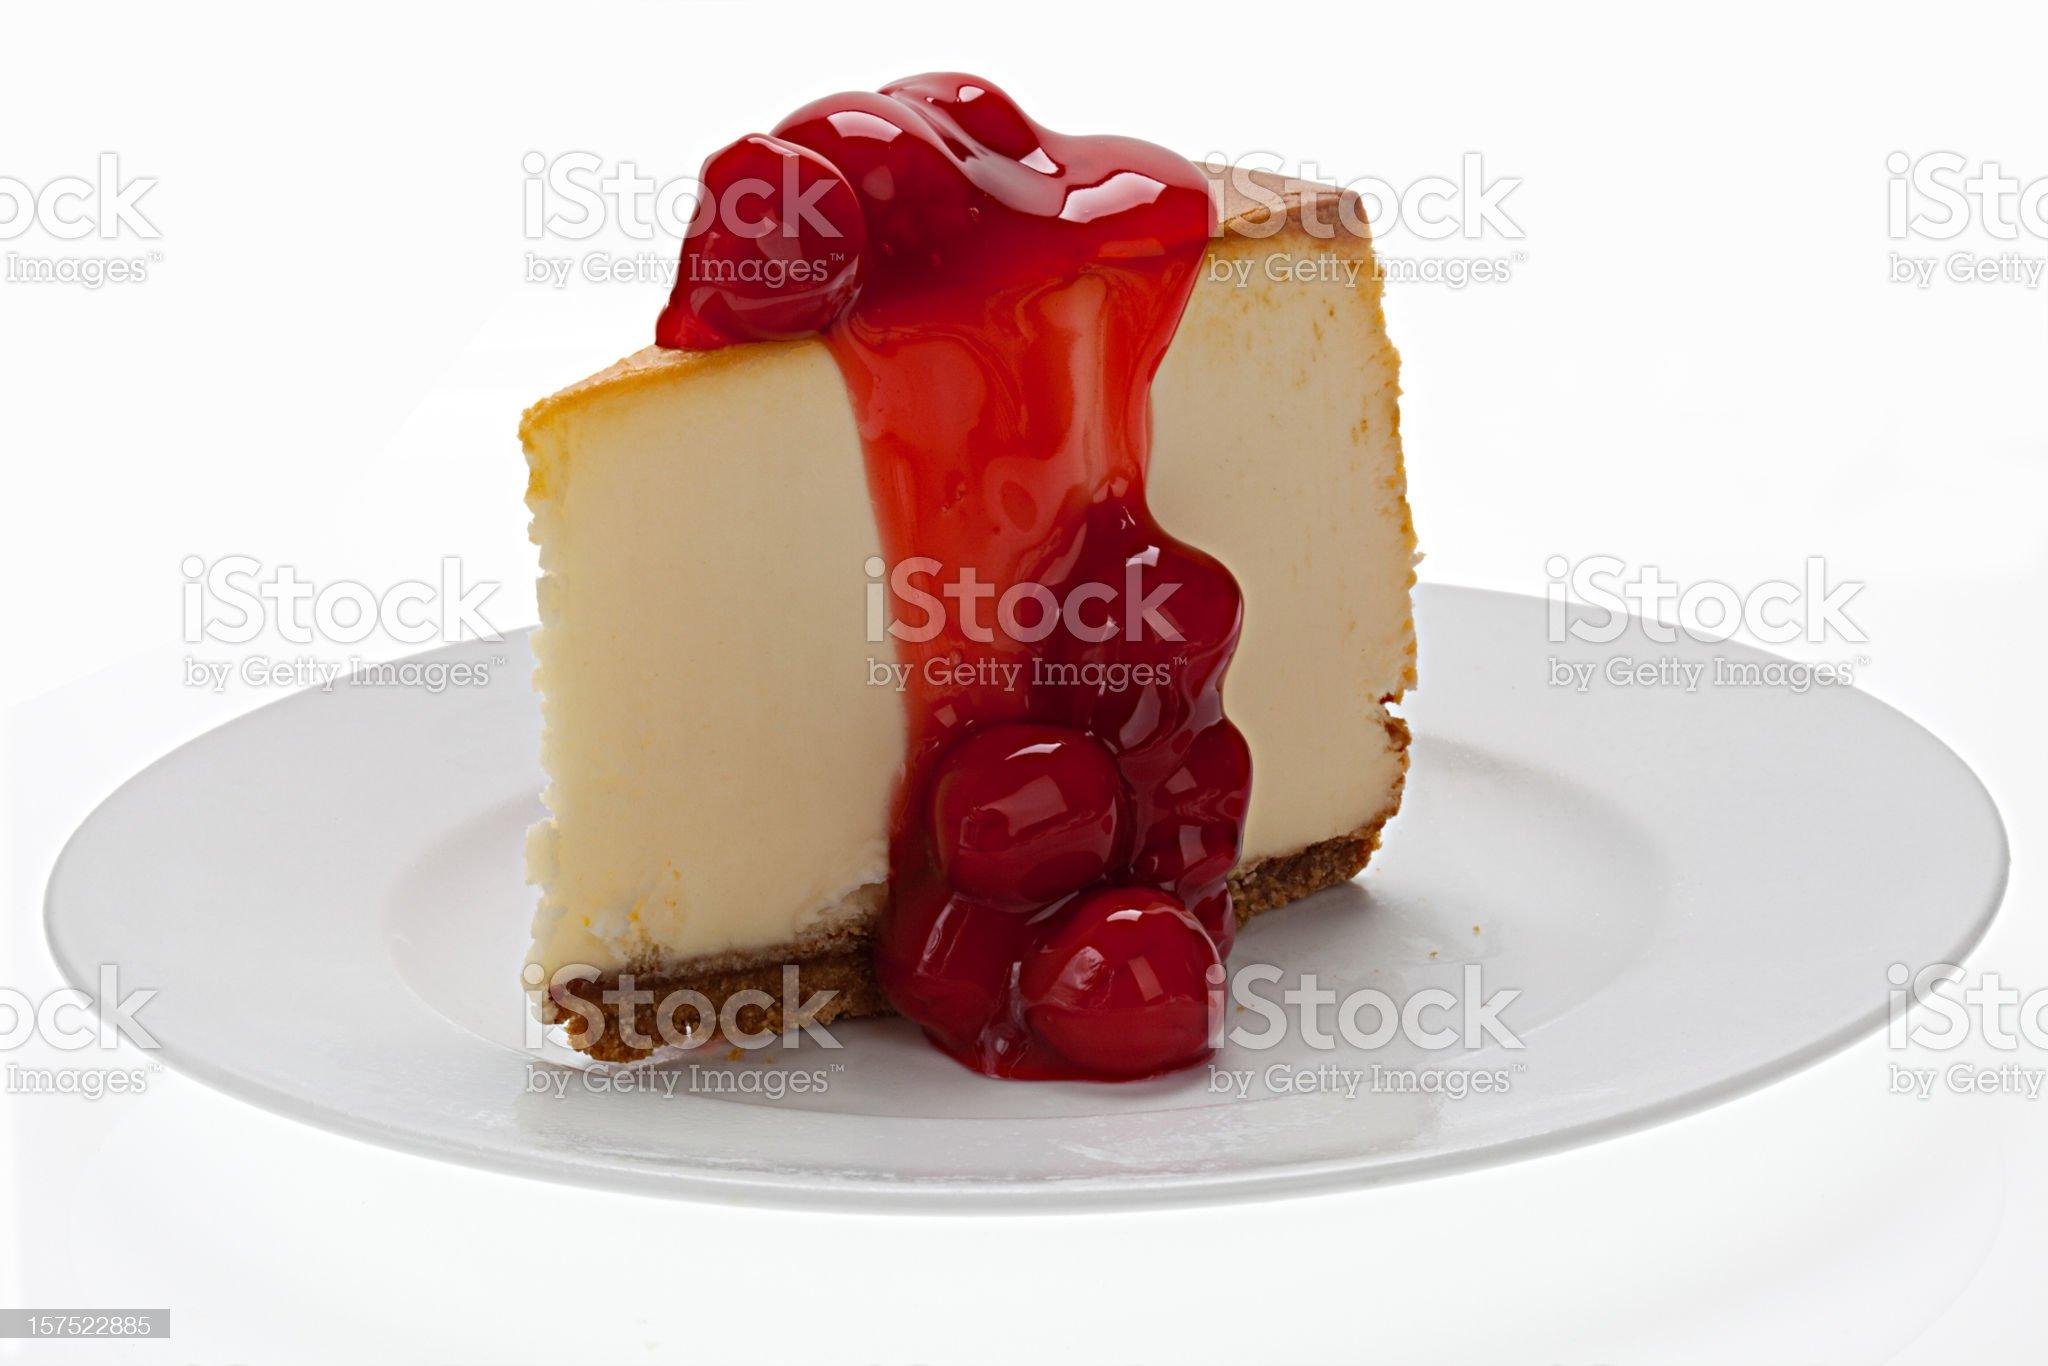 New York Cheesecake With Cherries royalty-free stock photo